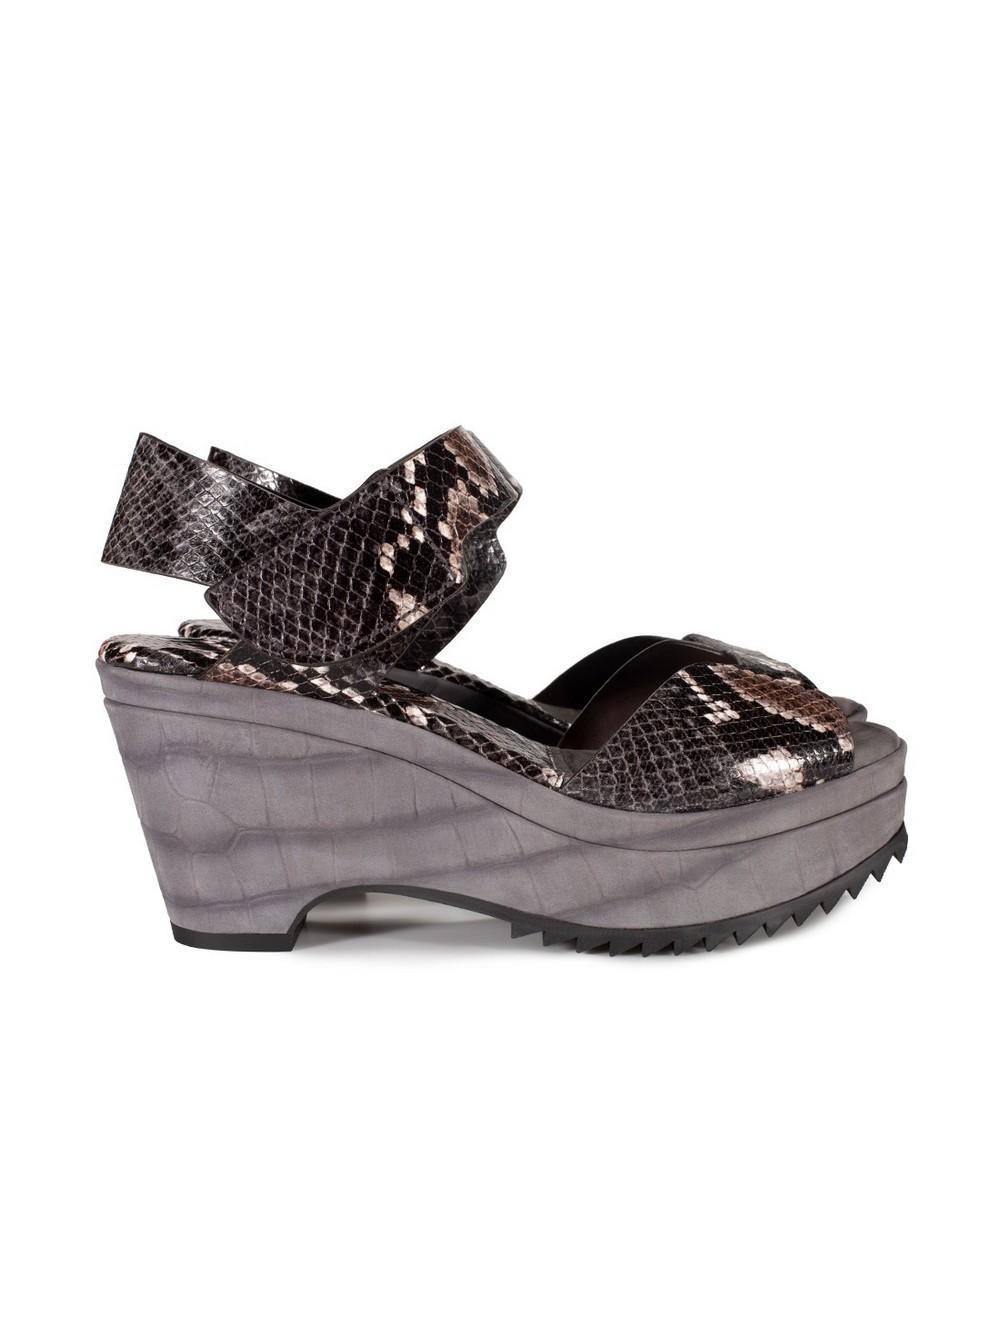 Fah Python Sandal